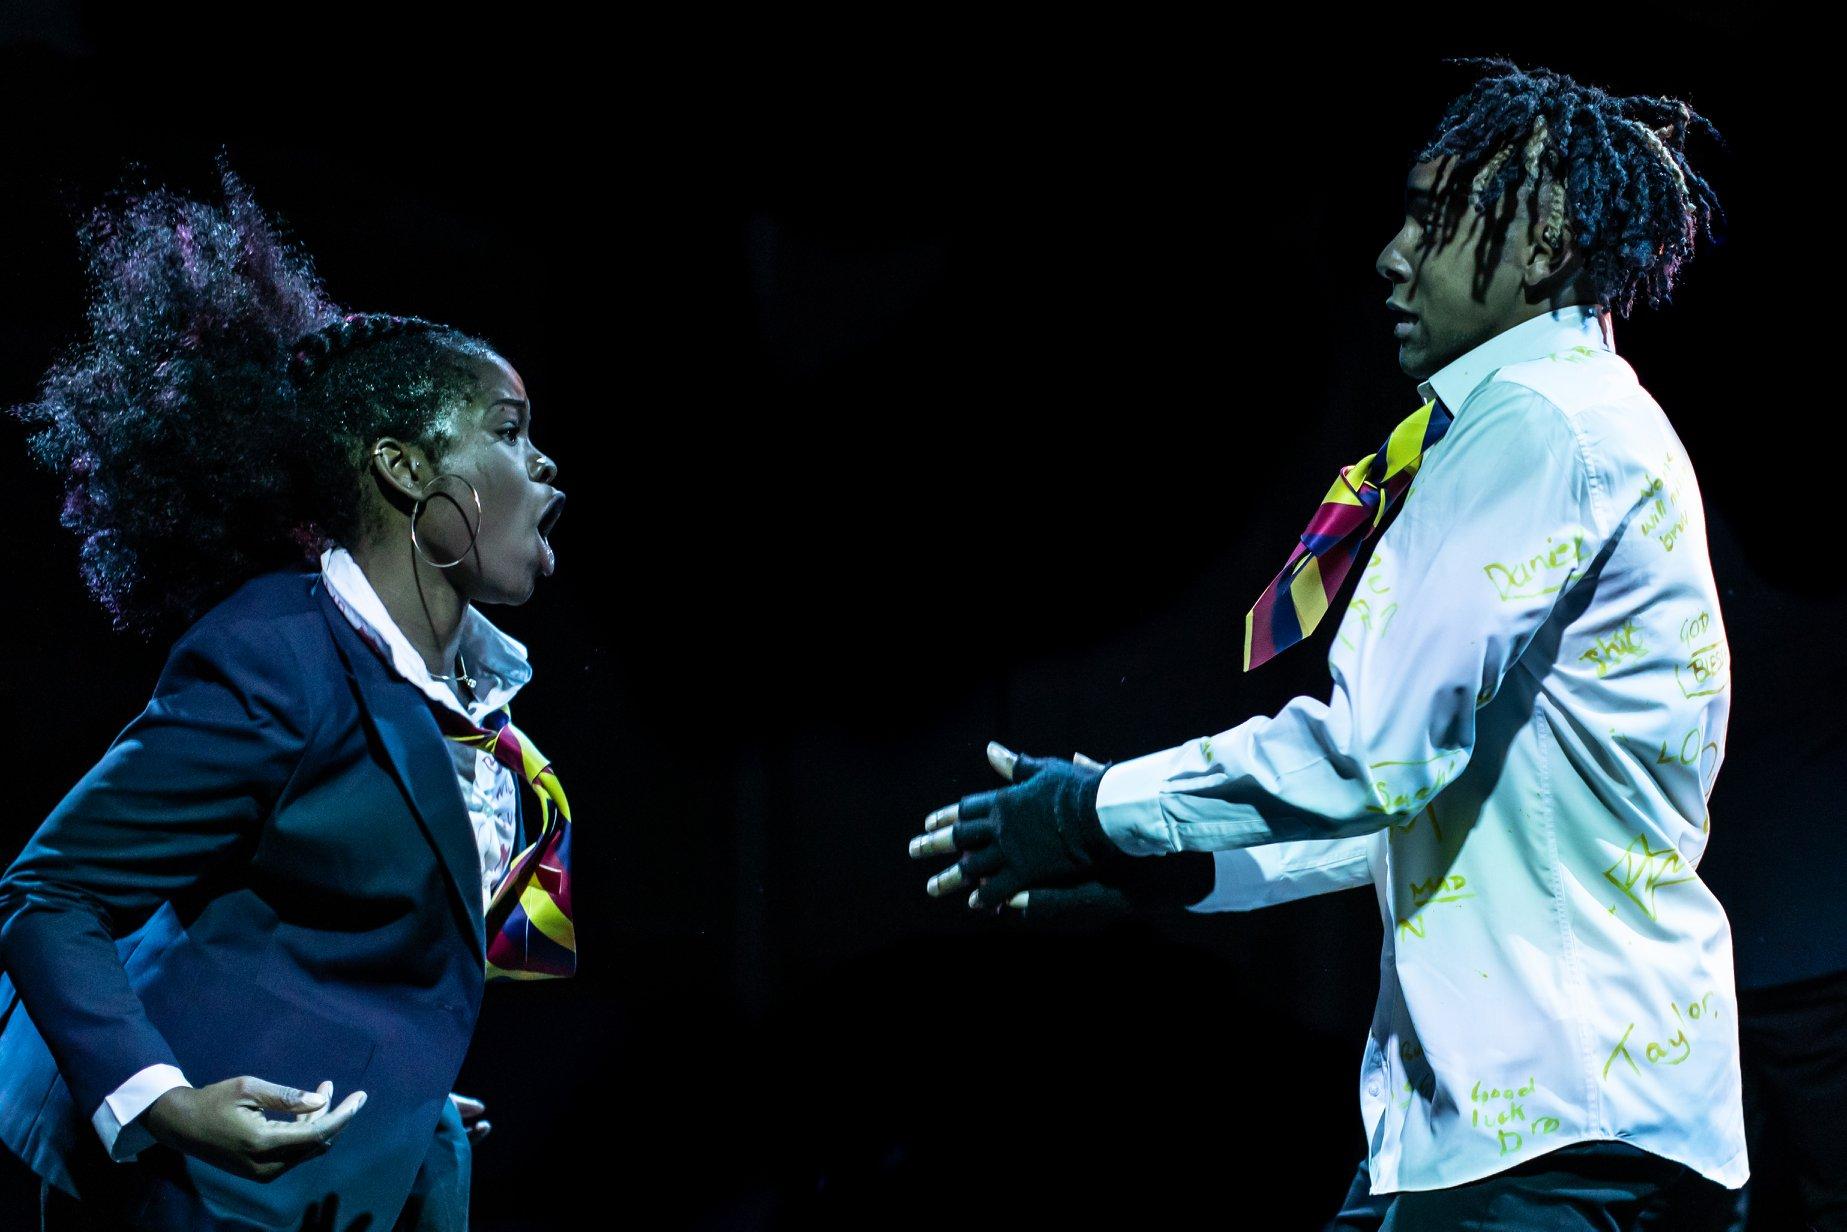 Rachel Nwokoro and Khai Shaw in LITTLE BABY JESUS by Arinzé Kene, directed by Tristan Fynn-Aiduenu, winner of the 2019 JMK Award (c) by Ali Wright